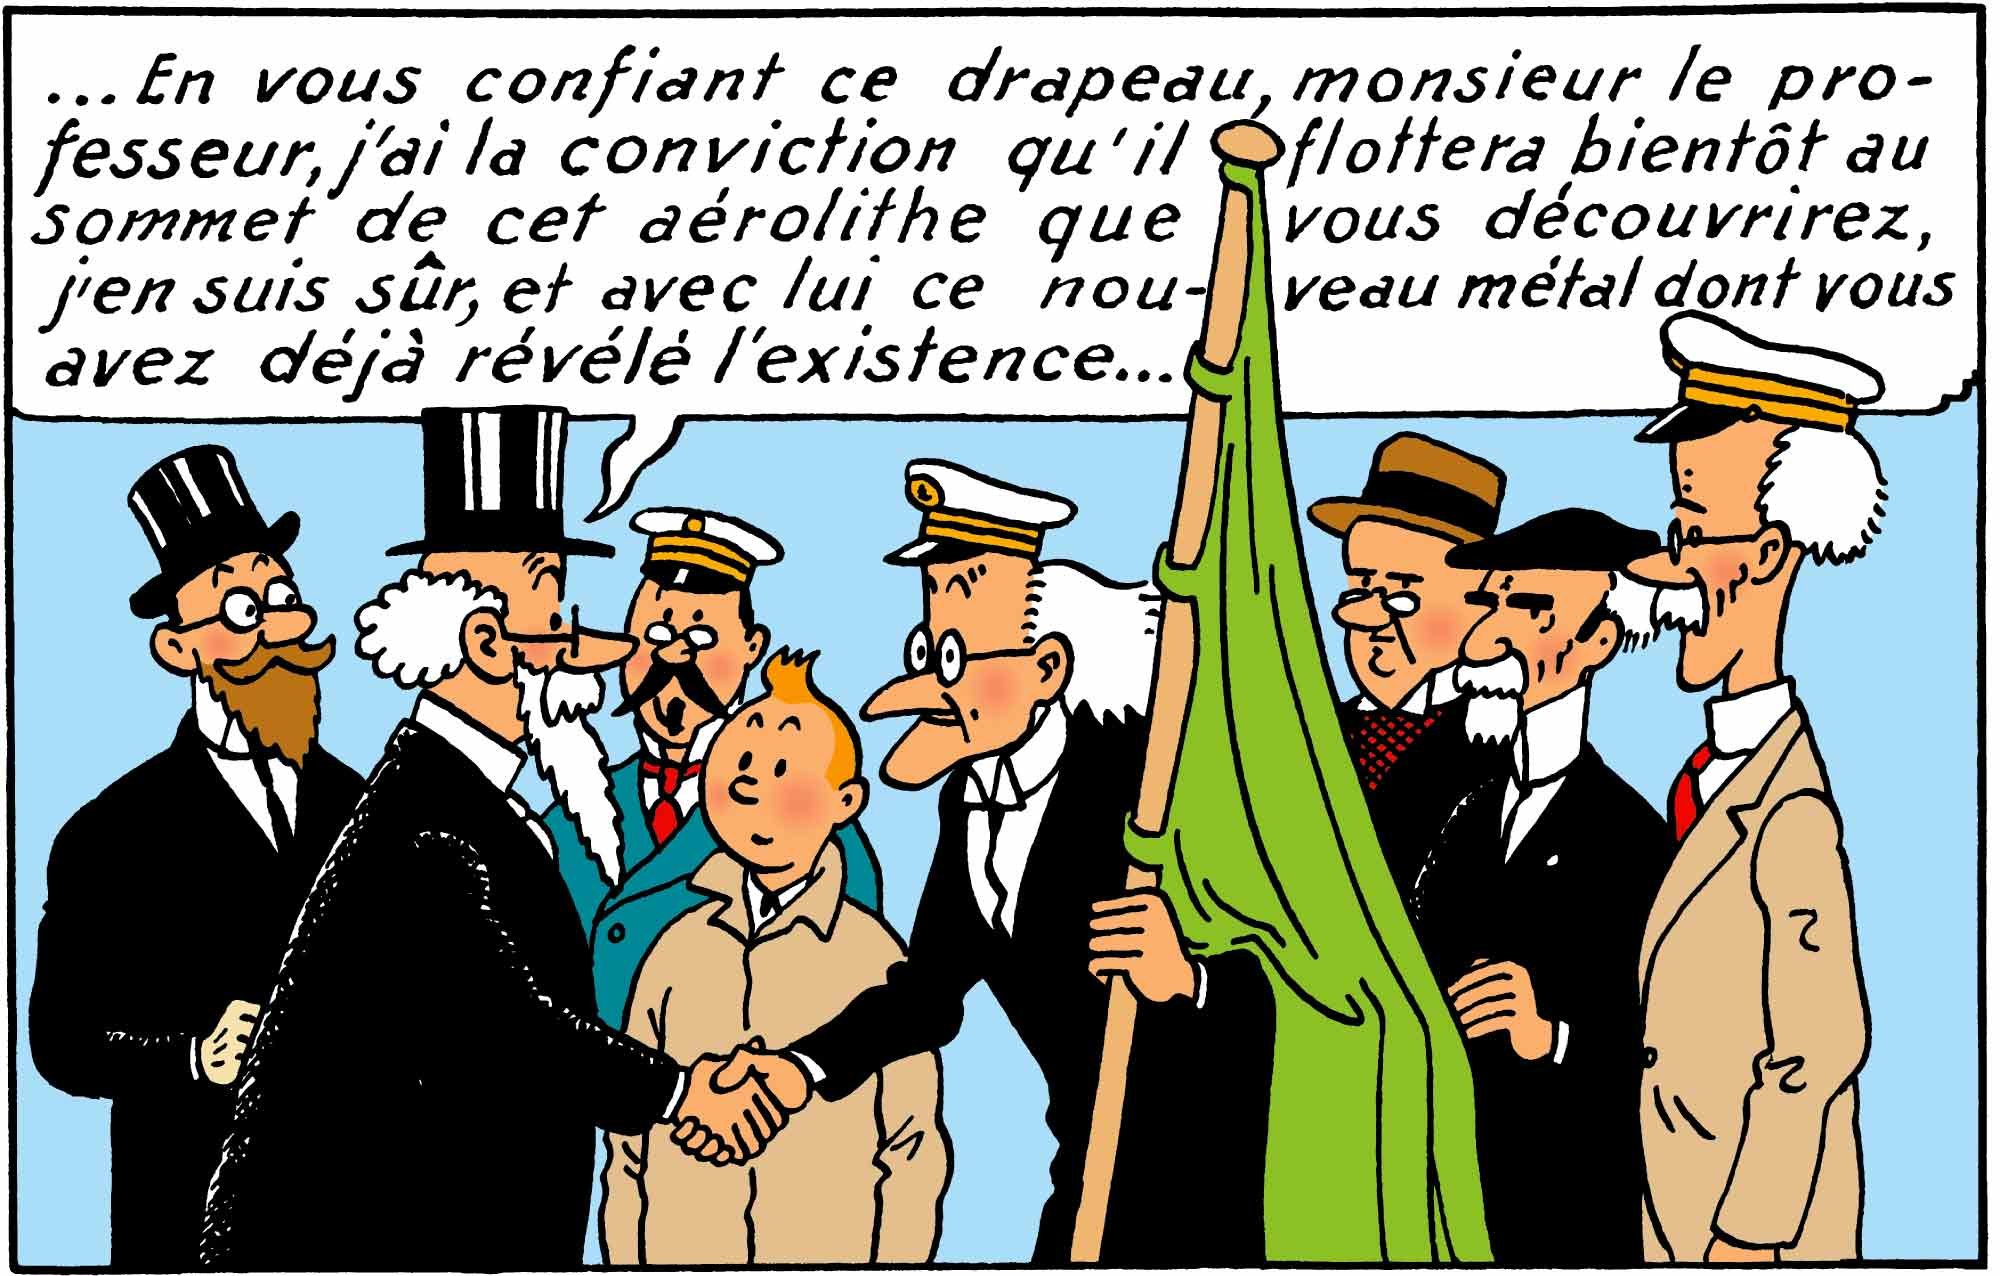 Tintin - Les Aventures de Tintin - L'Etoile Mystérieuse